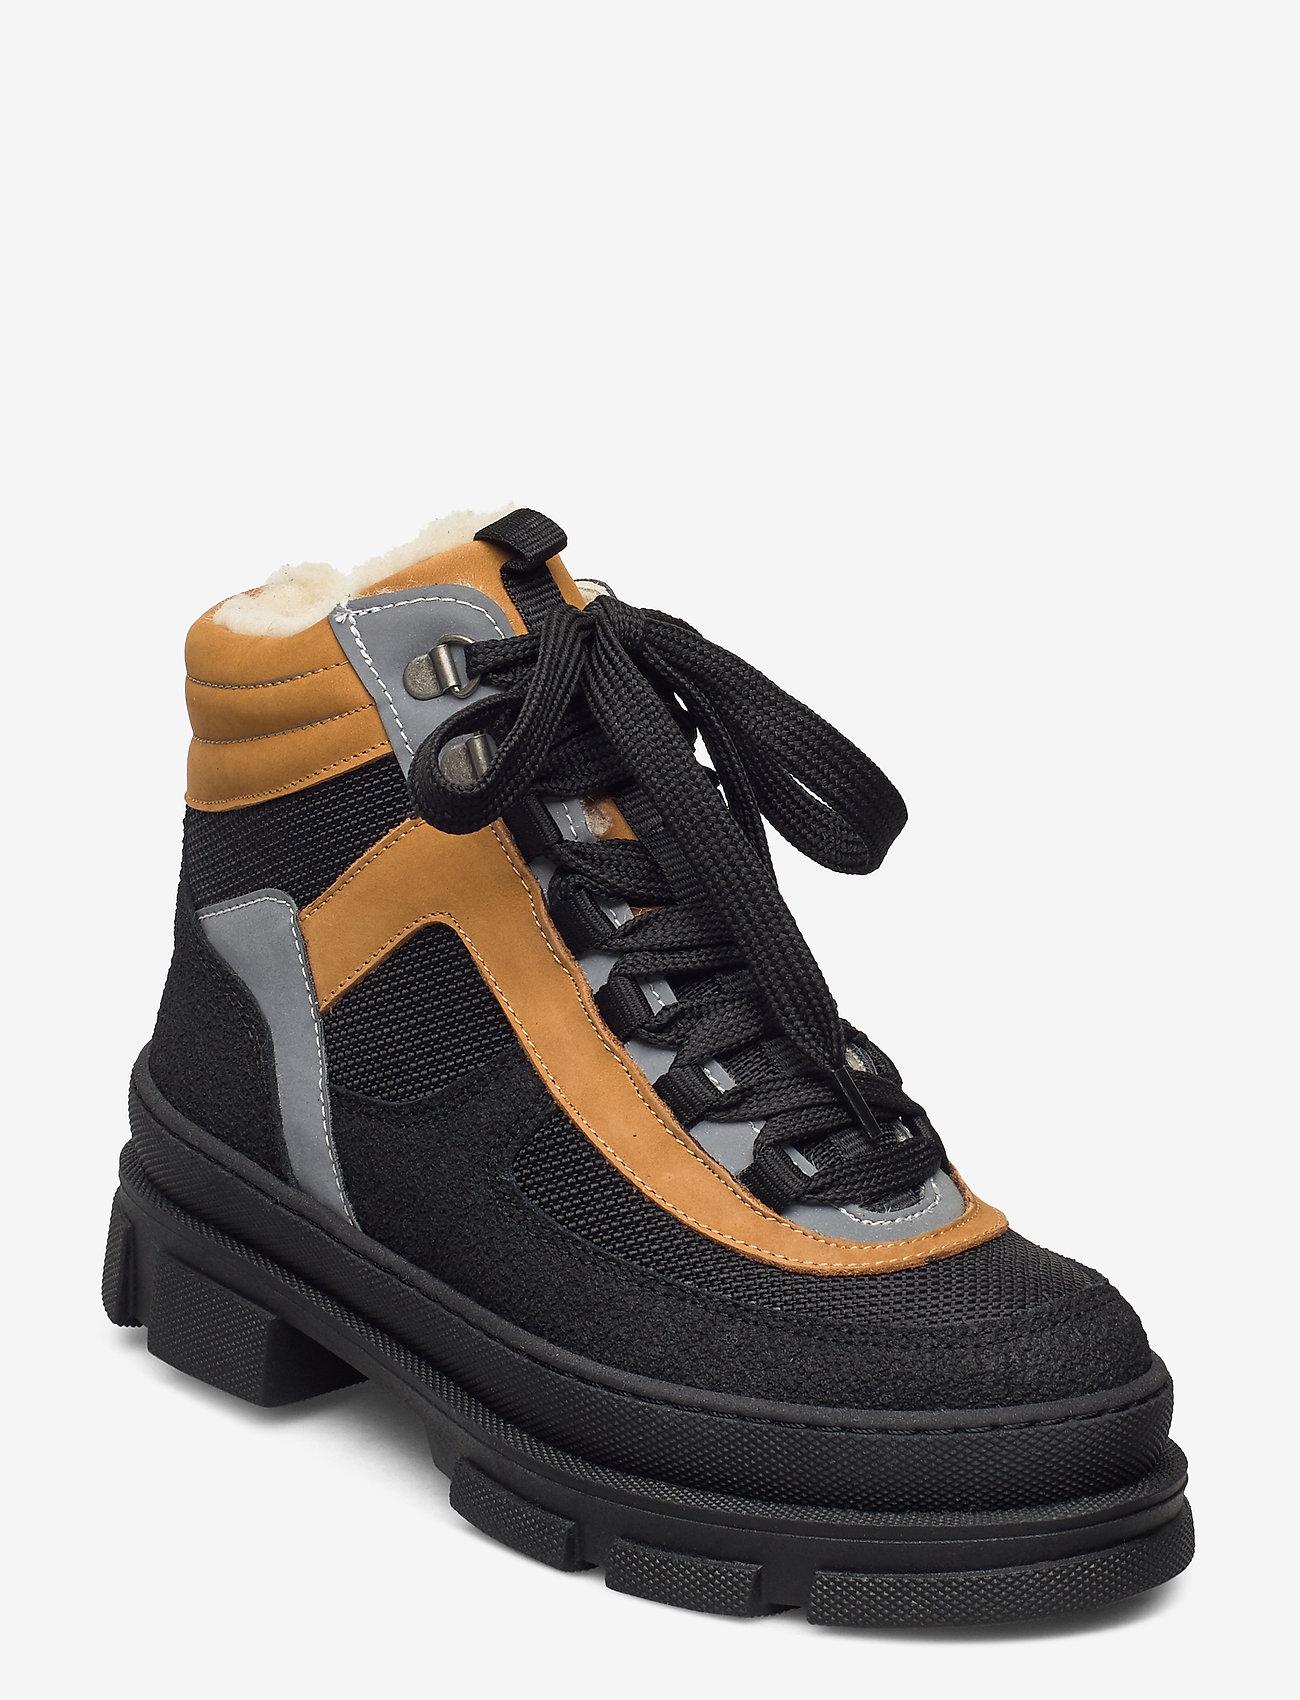 ANGULUS - Boots - flat - flade ankelstøvler - 1321/1631/1262/2012 sort/sort/ - 0